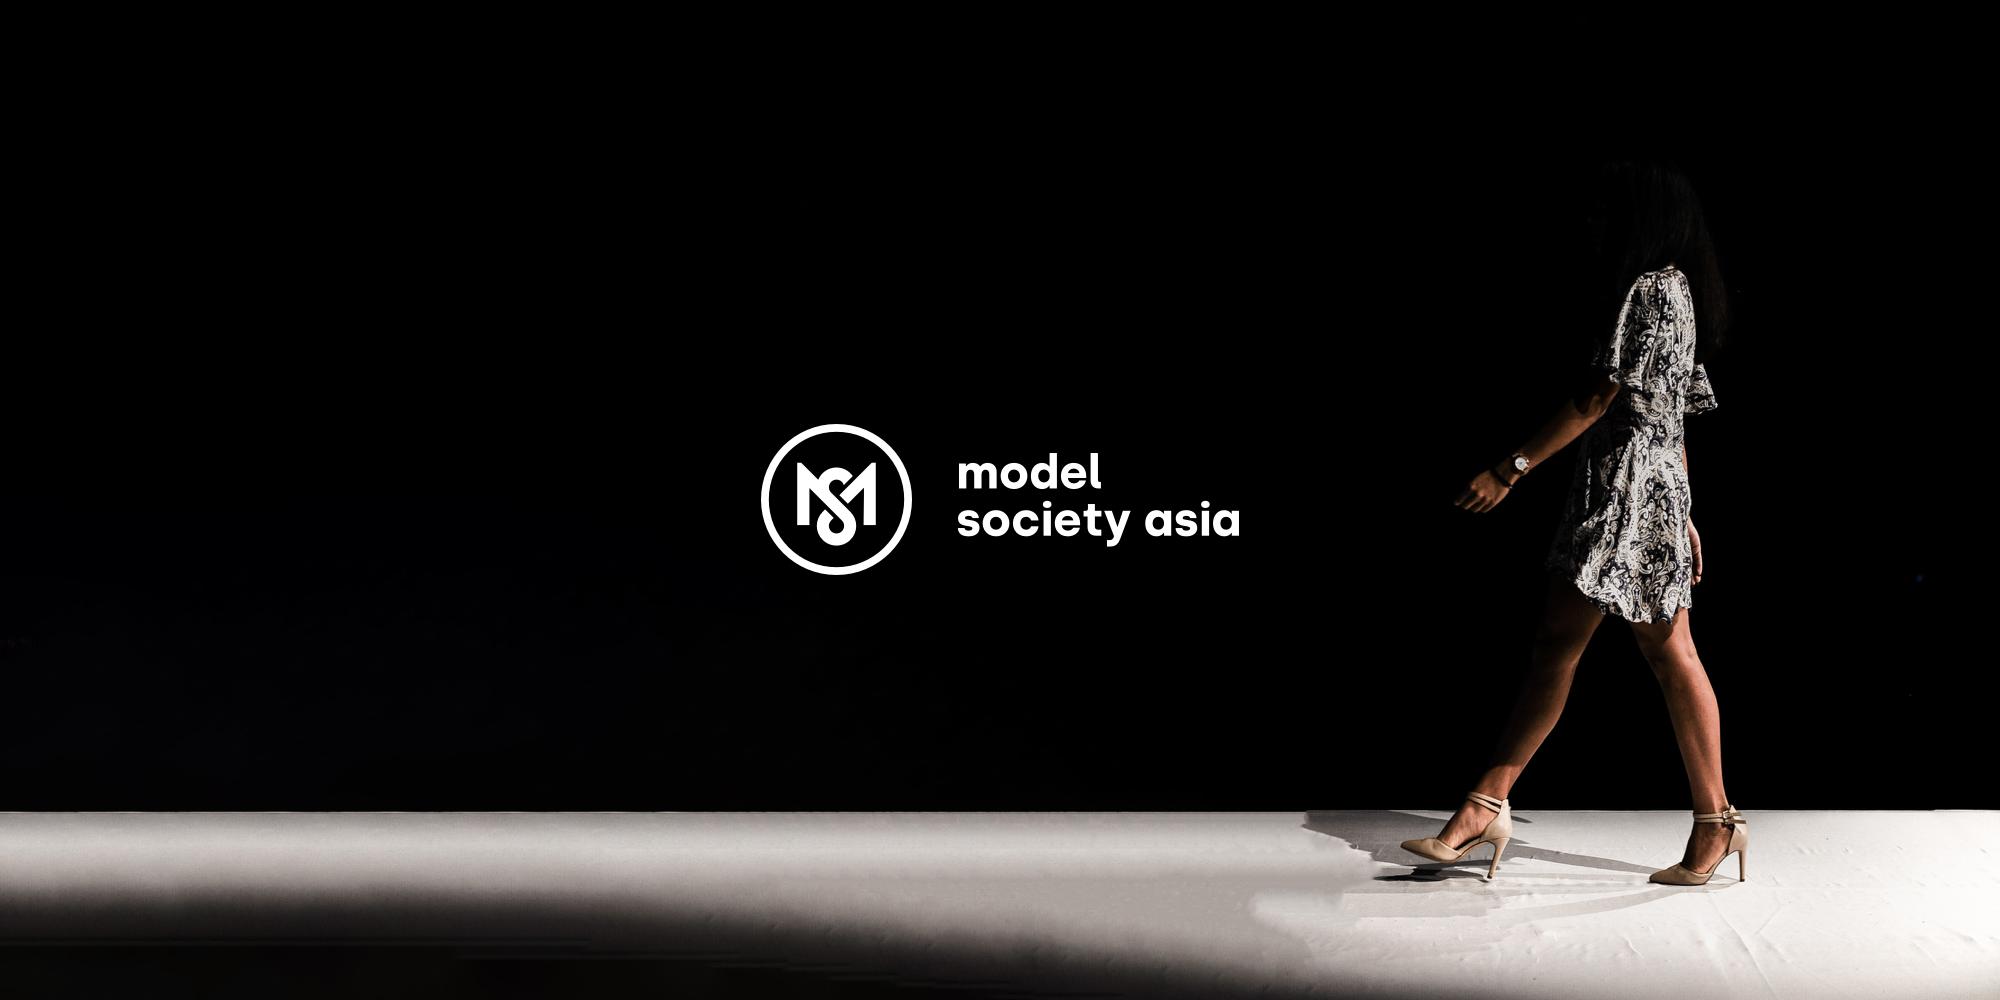 KOS Design - Model Society Asia